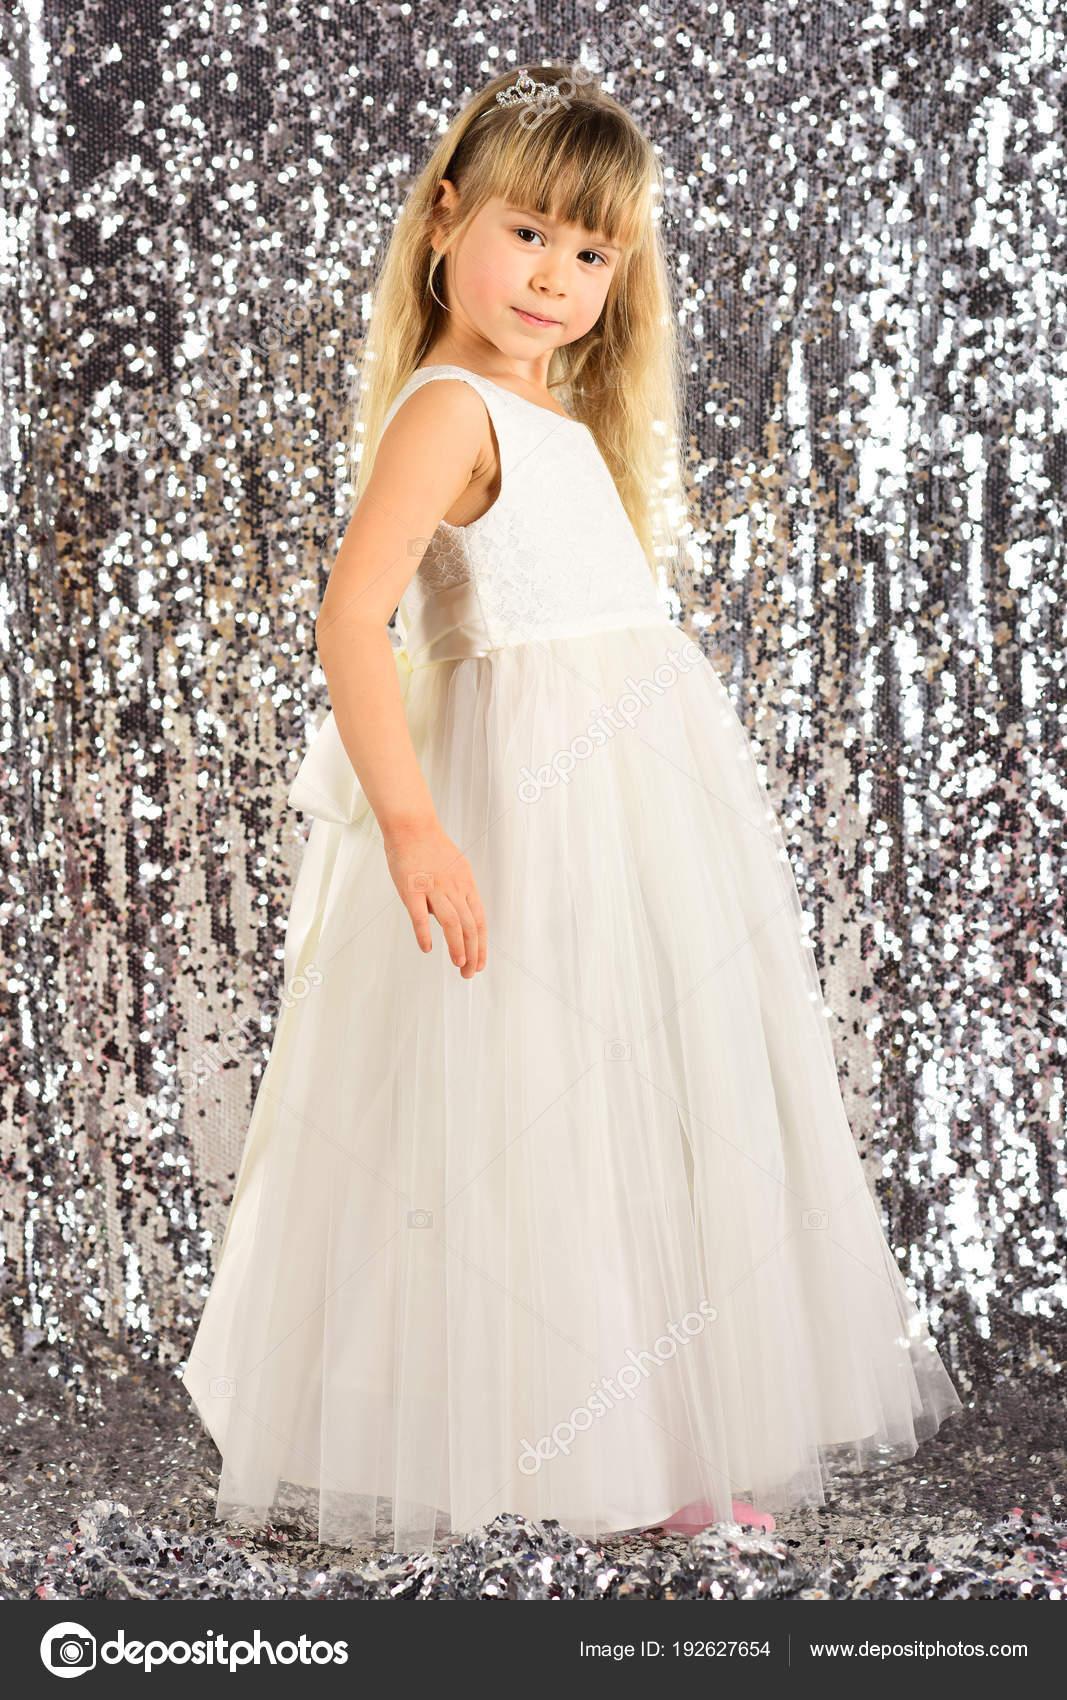 7fb85b2534c8 Elegance Stylish Look Elegance Little Girl Dress — Stock Photo ...